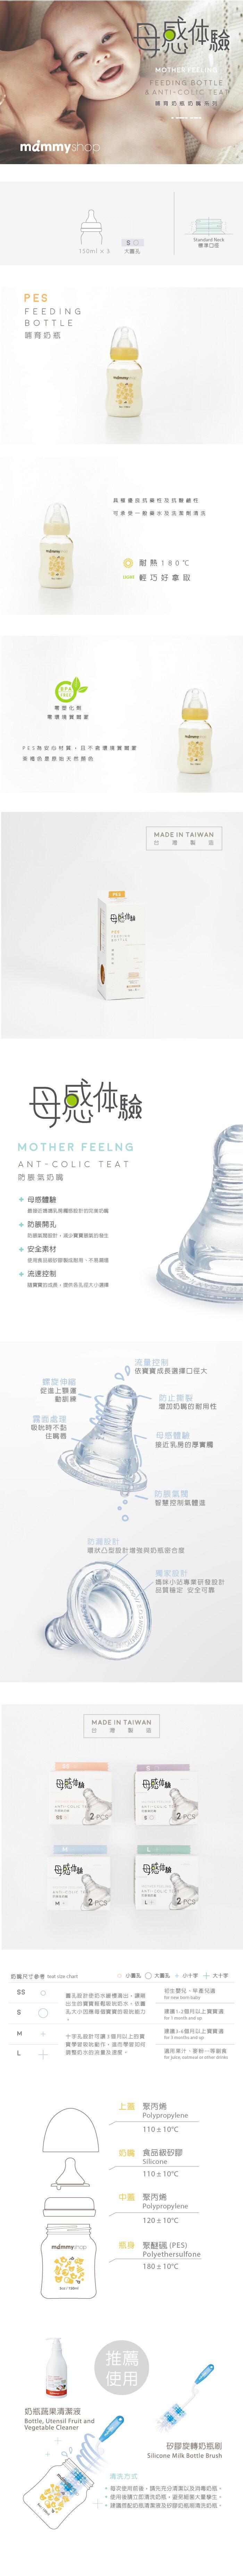 Mammyshop媽咪小站 - 母感體驗 PES防脹氣奶瓶 標準口徑 150ml 3入 超值組 1